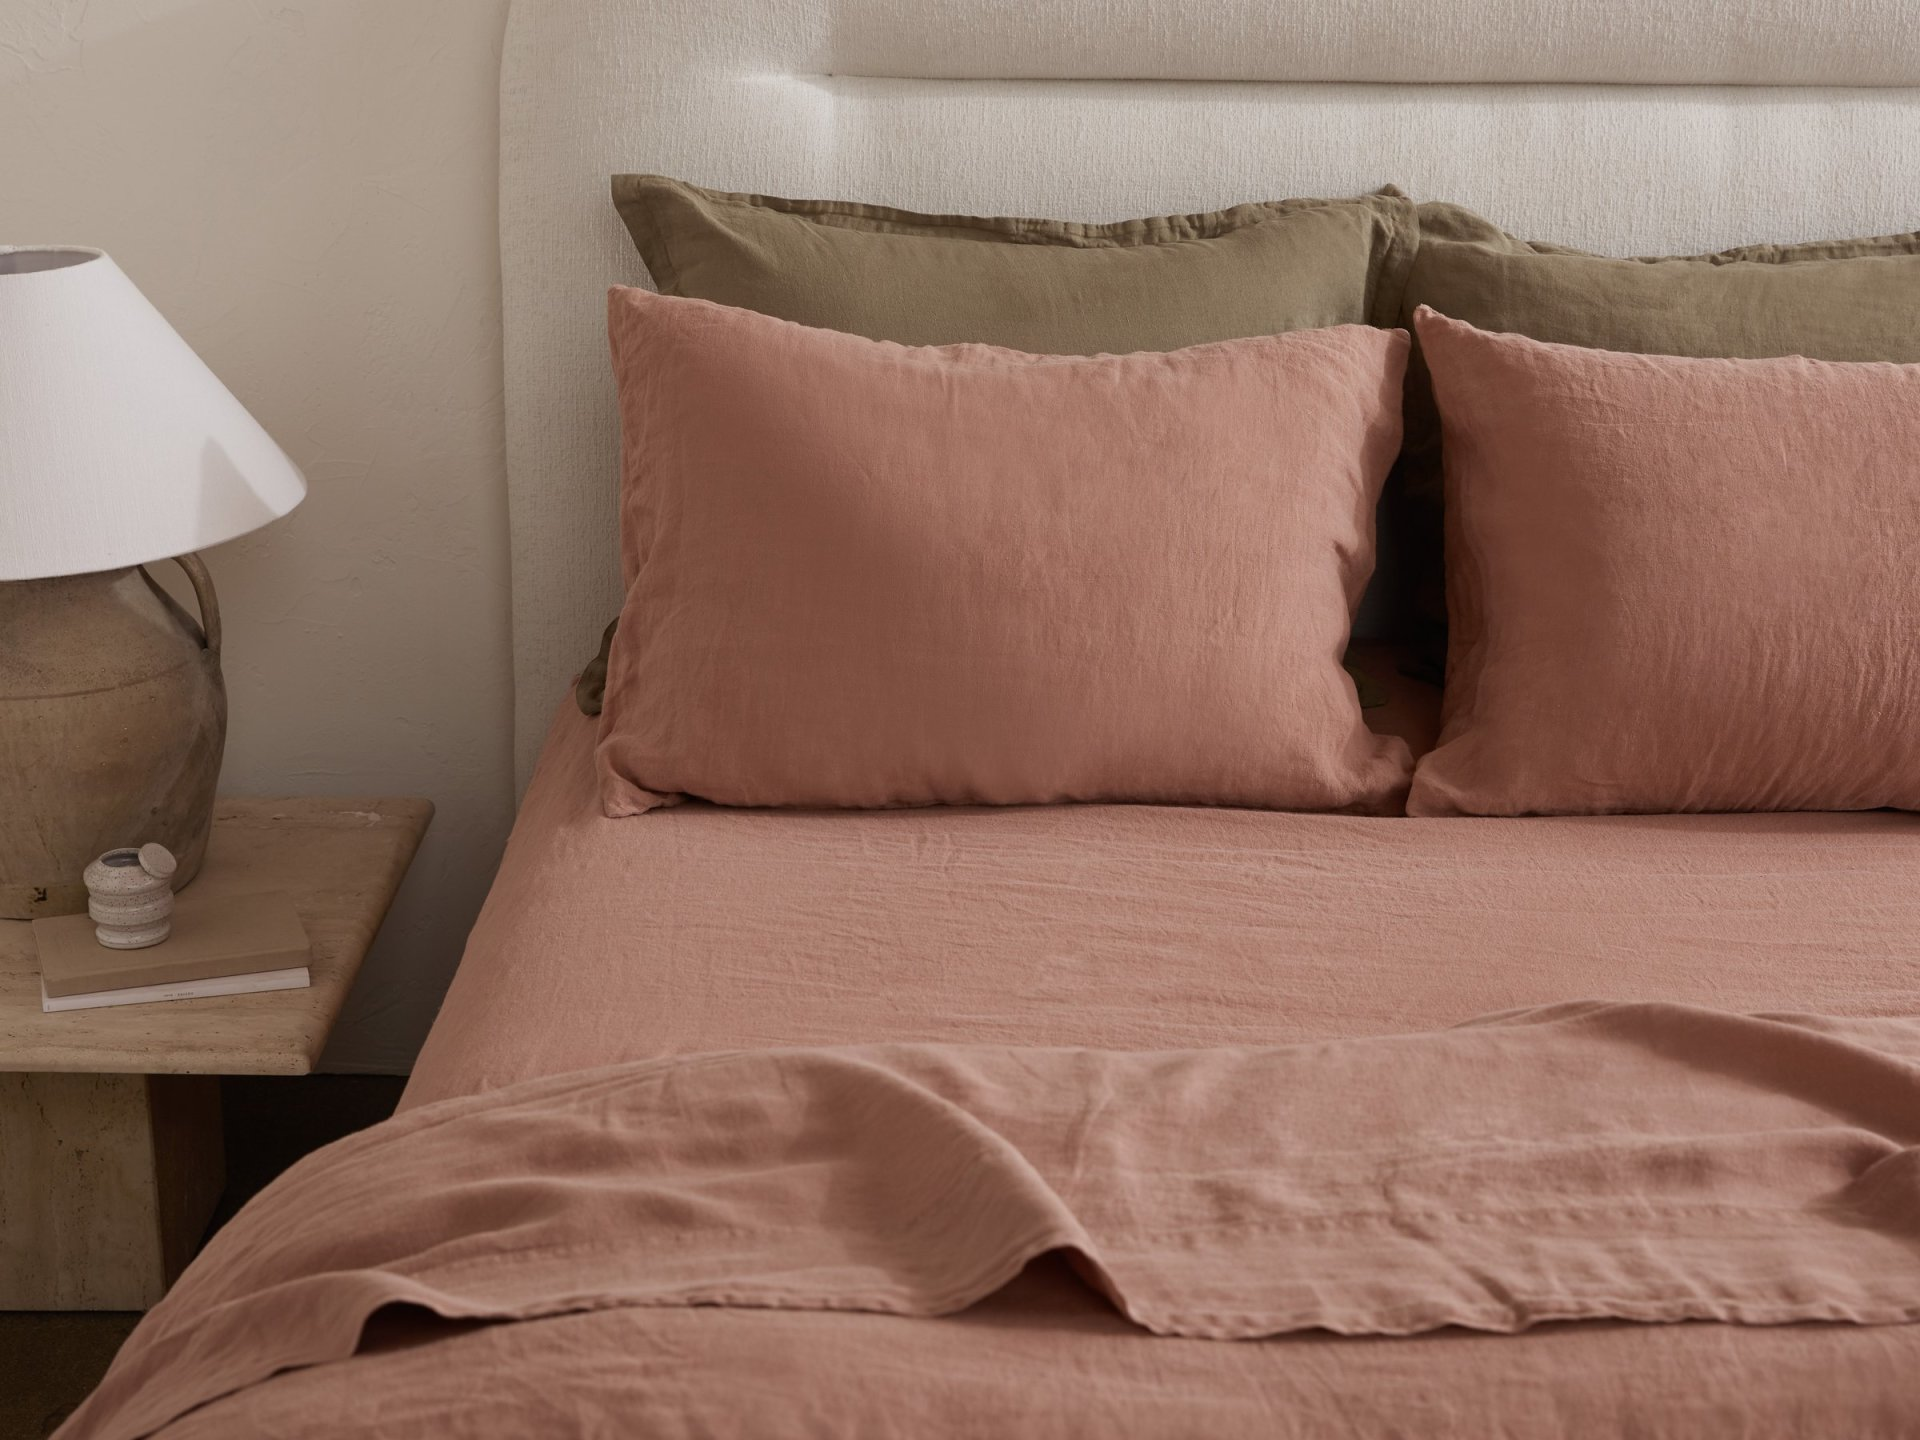 soft breathable european flax sheets